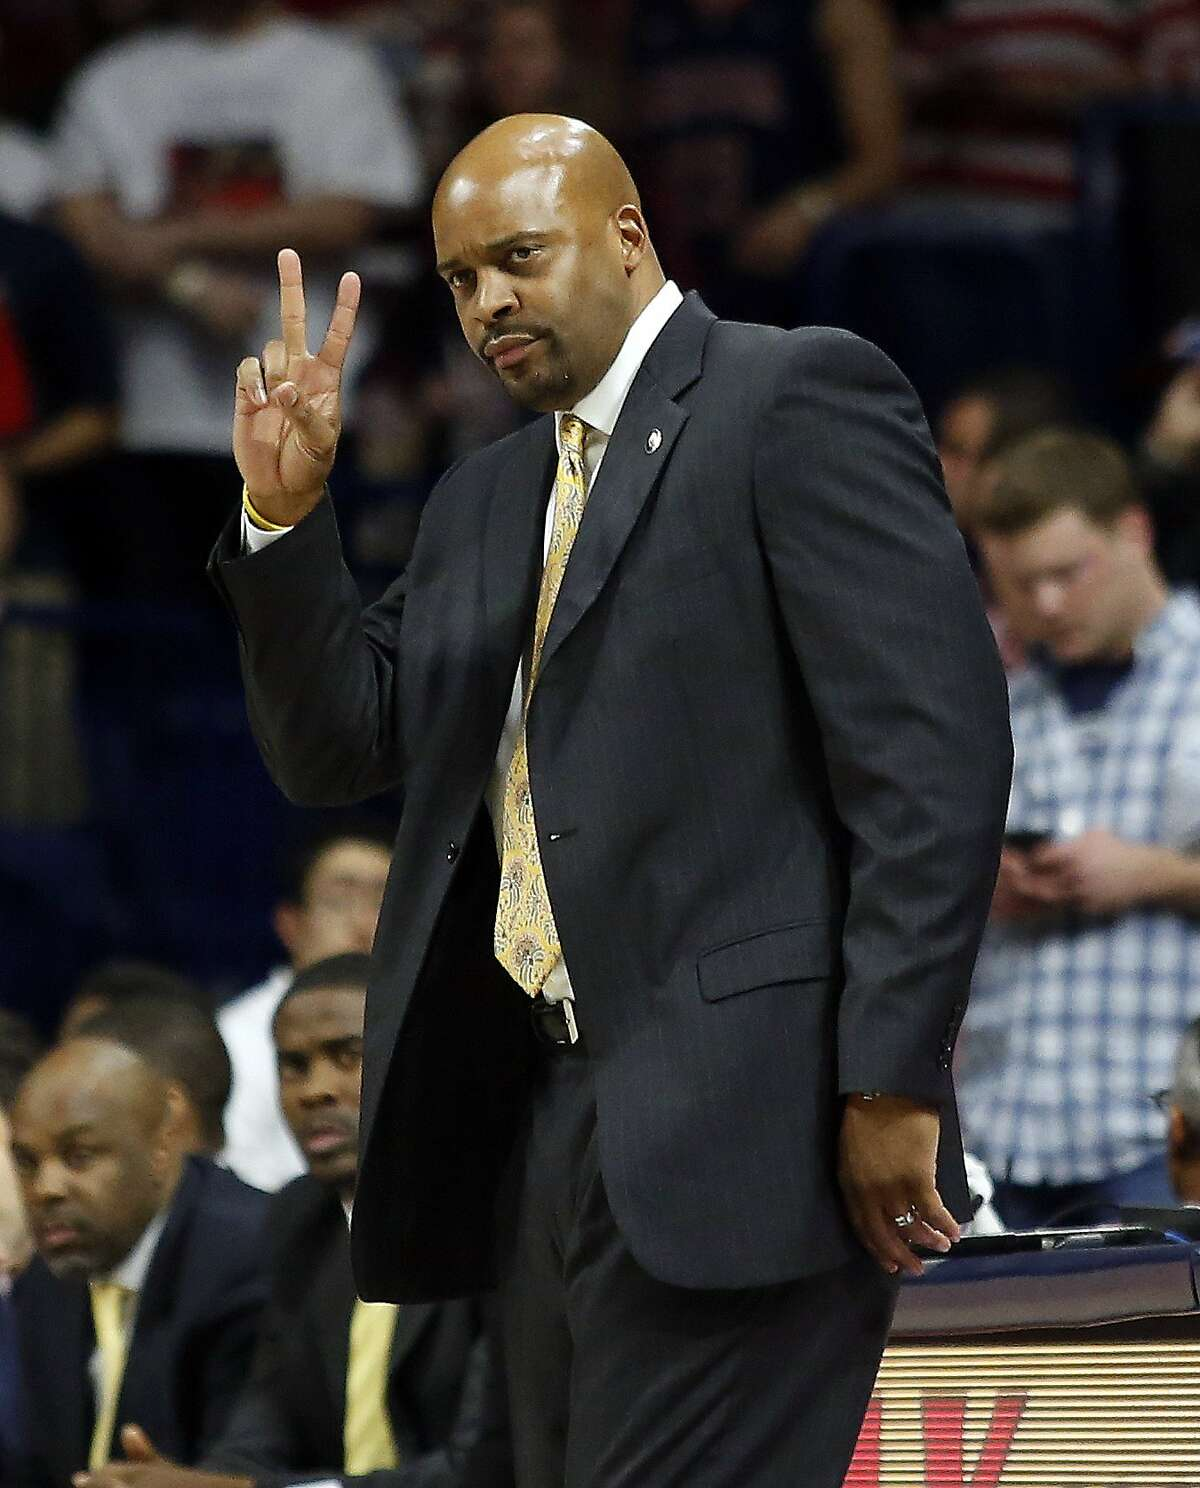 California head coach Cuonzo Martin calls out a play against Arizona during the first half of an NCAA college basketball game, Thursday, March 5, 2015, in Tucson, Ariz. (AP Photo/Rick Scuteri)